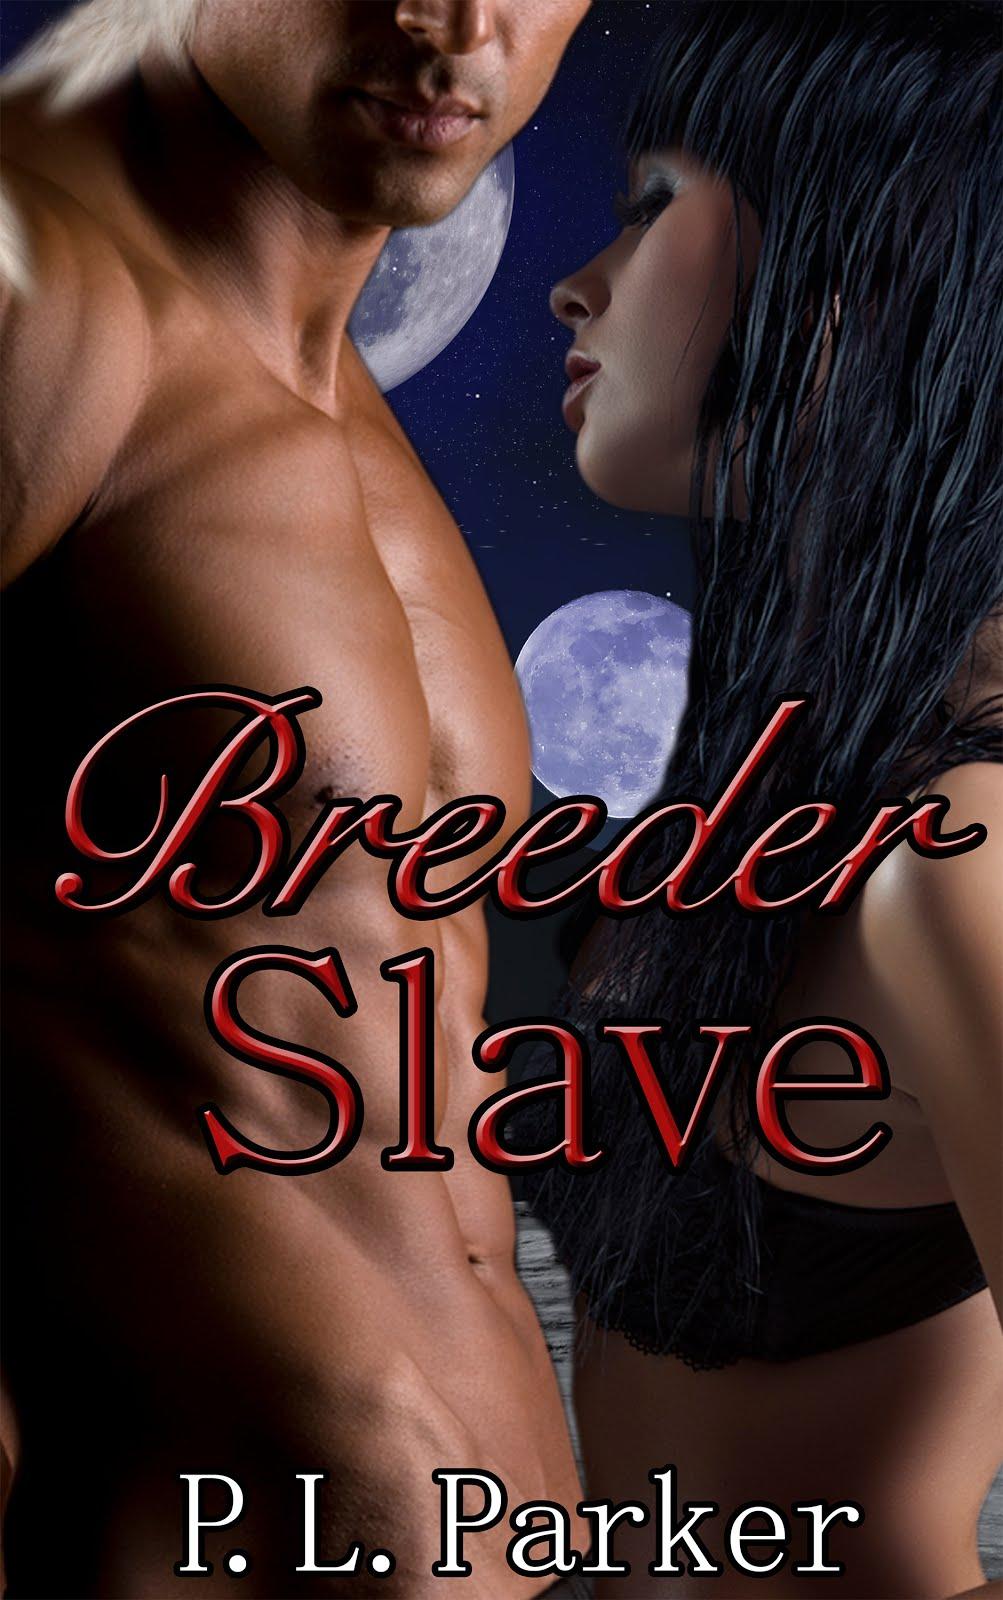 Breeder Slave